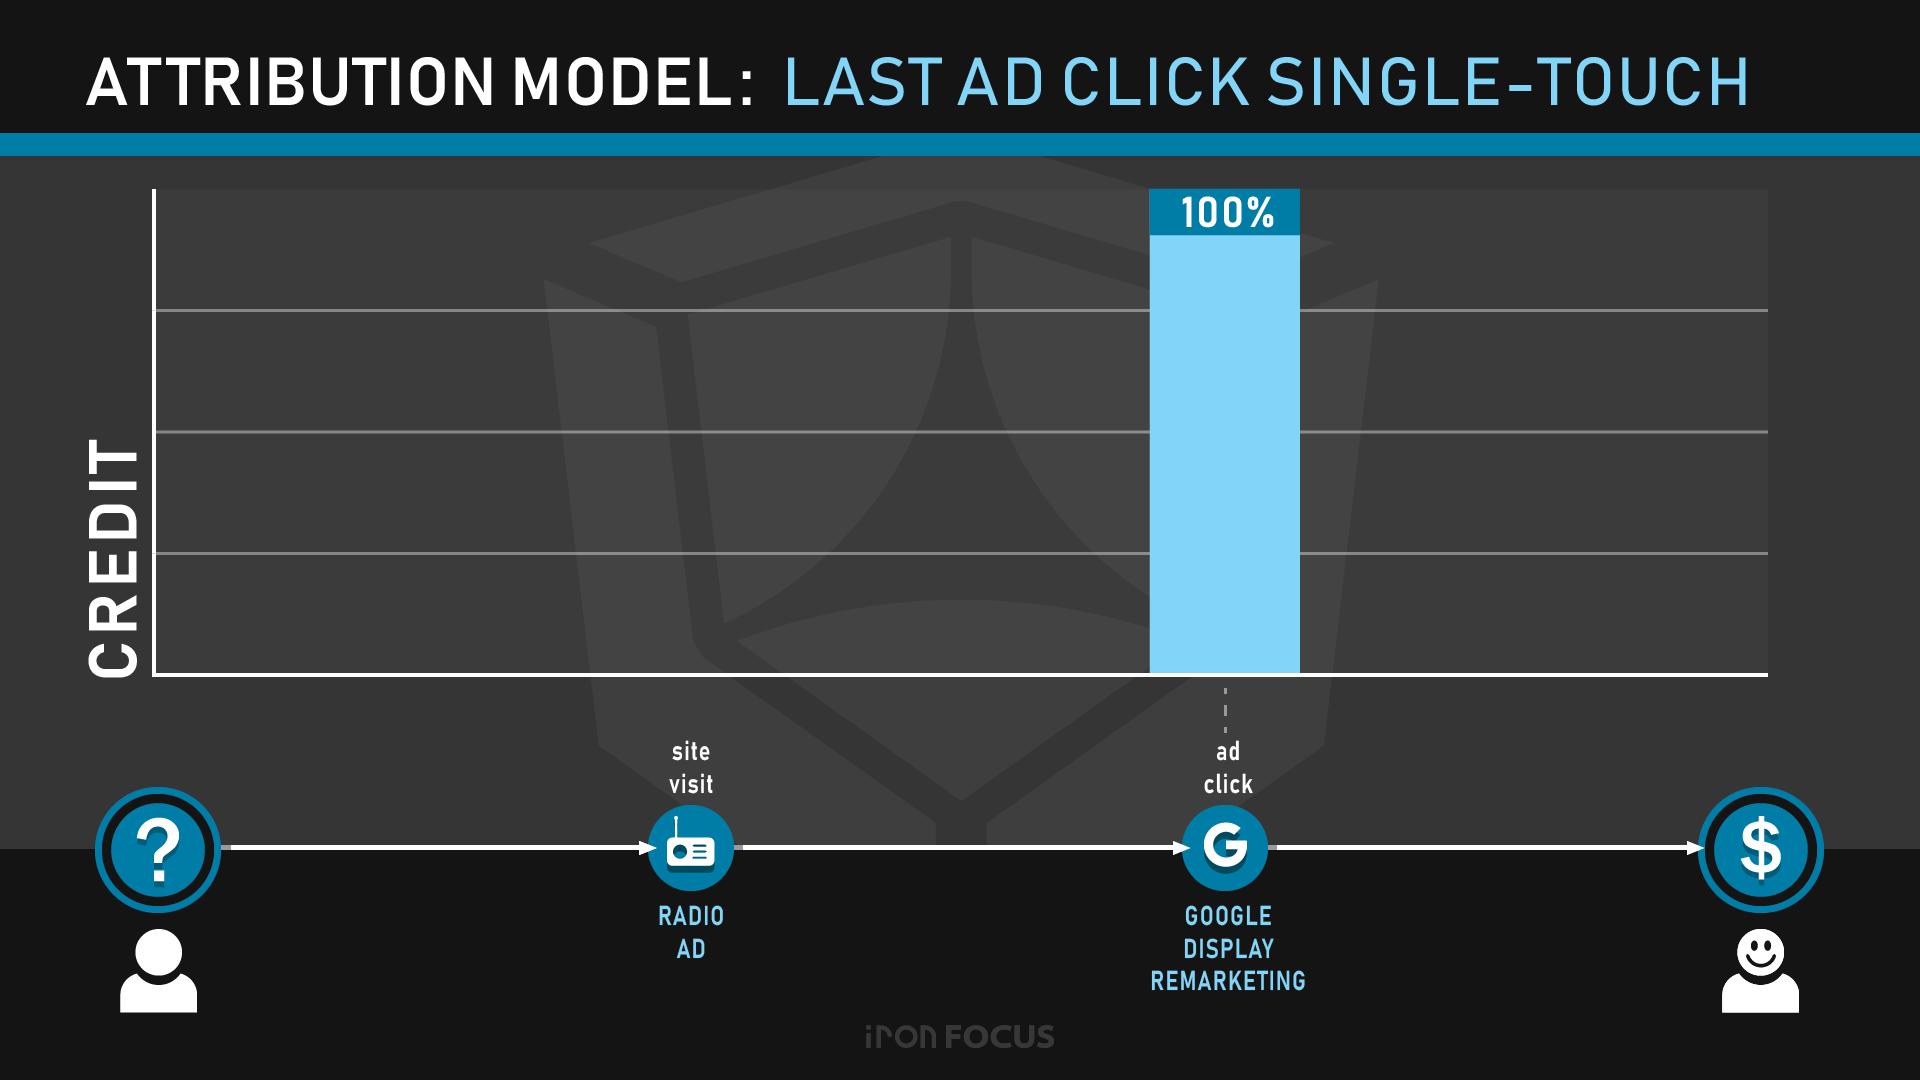 Attribution Model: Last Ad Click Single-Touch